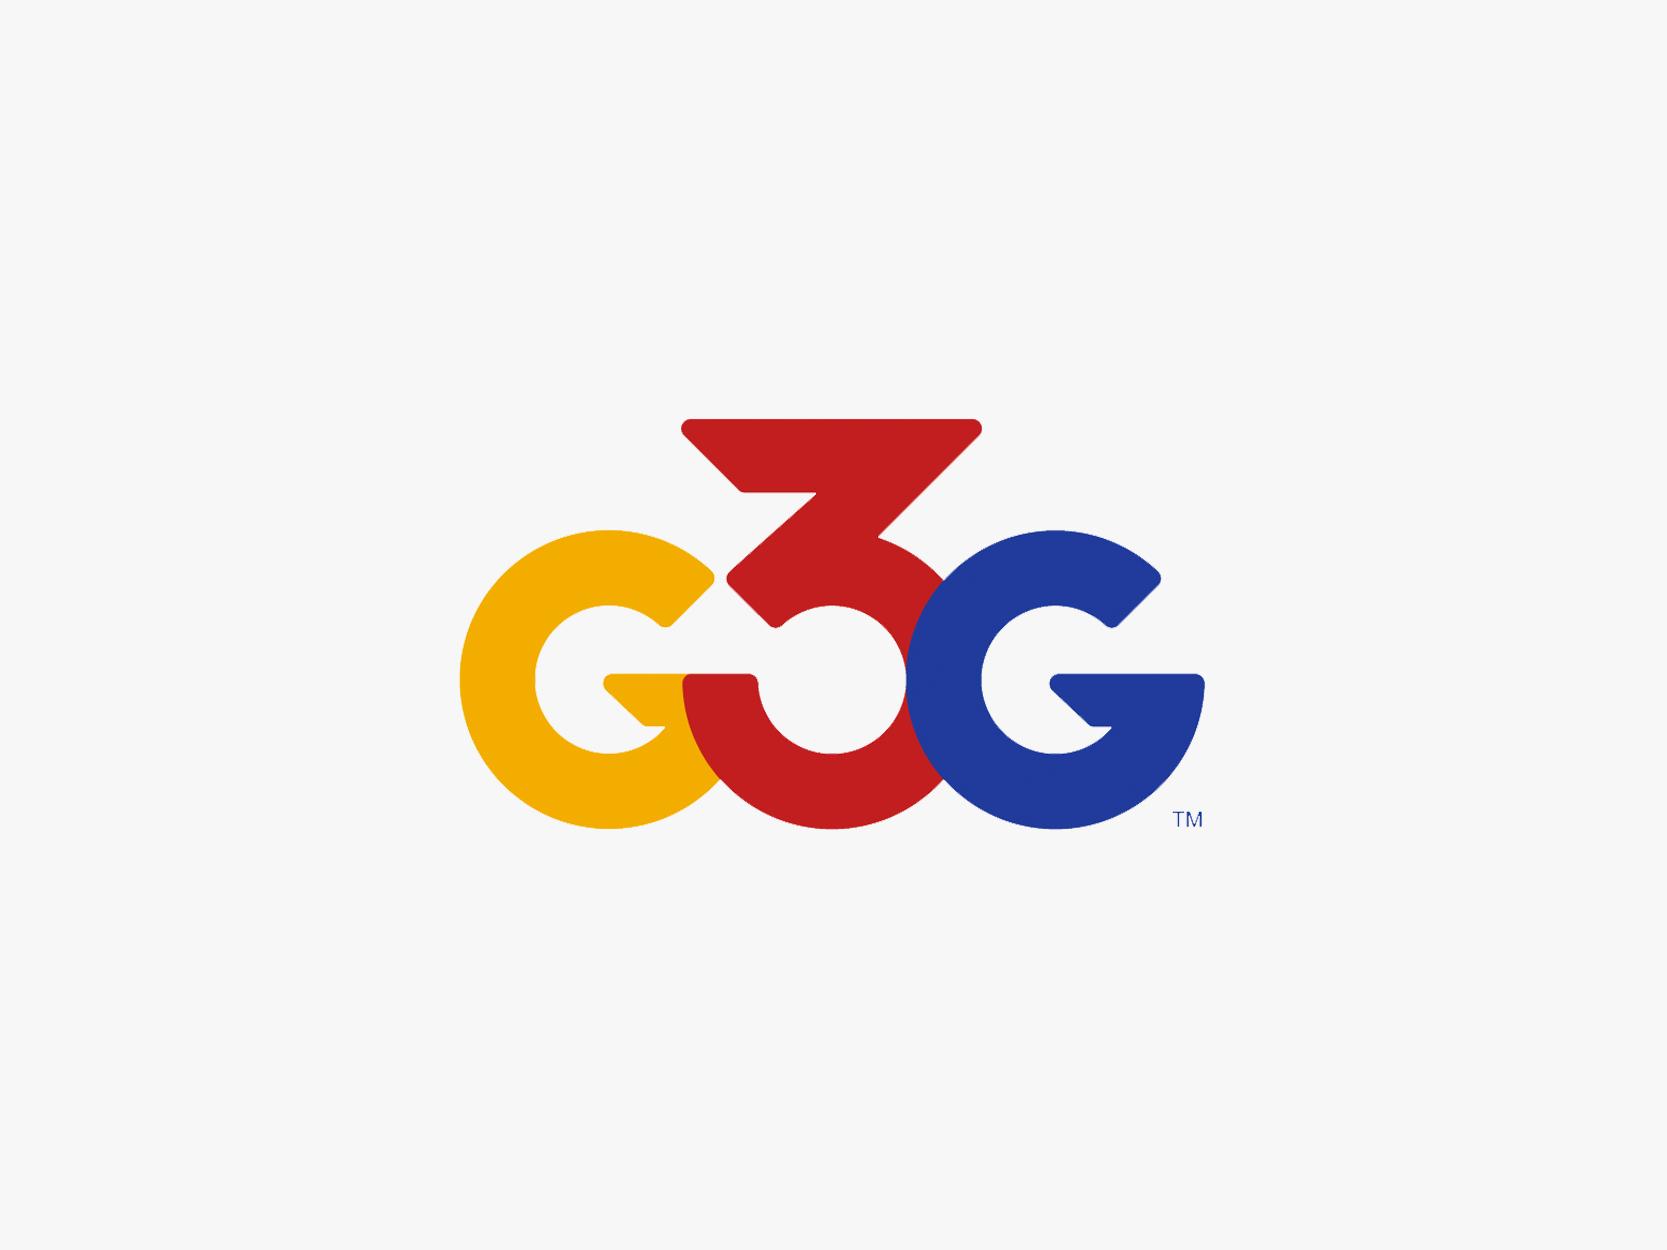 G3G.jpg